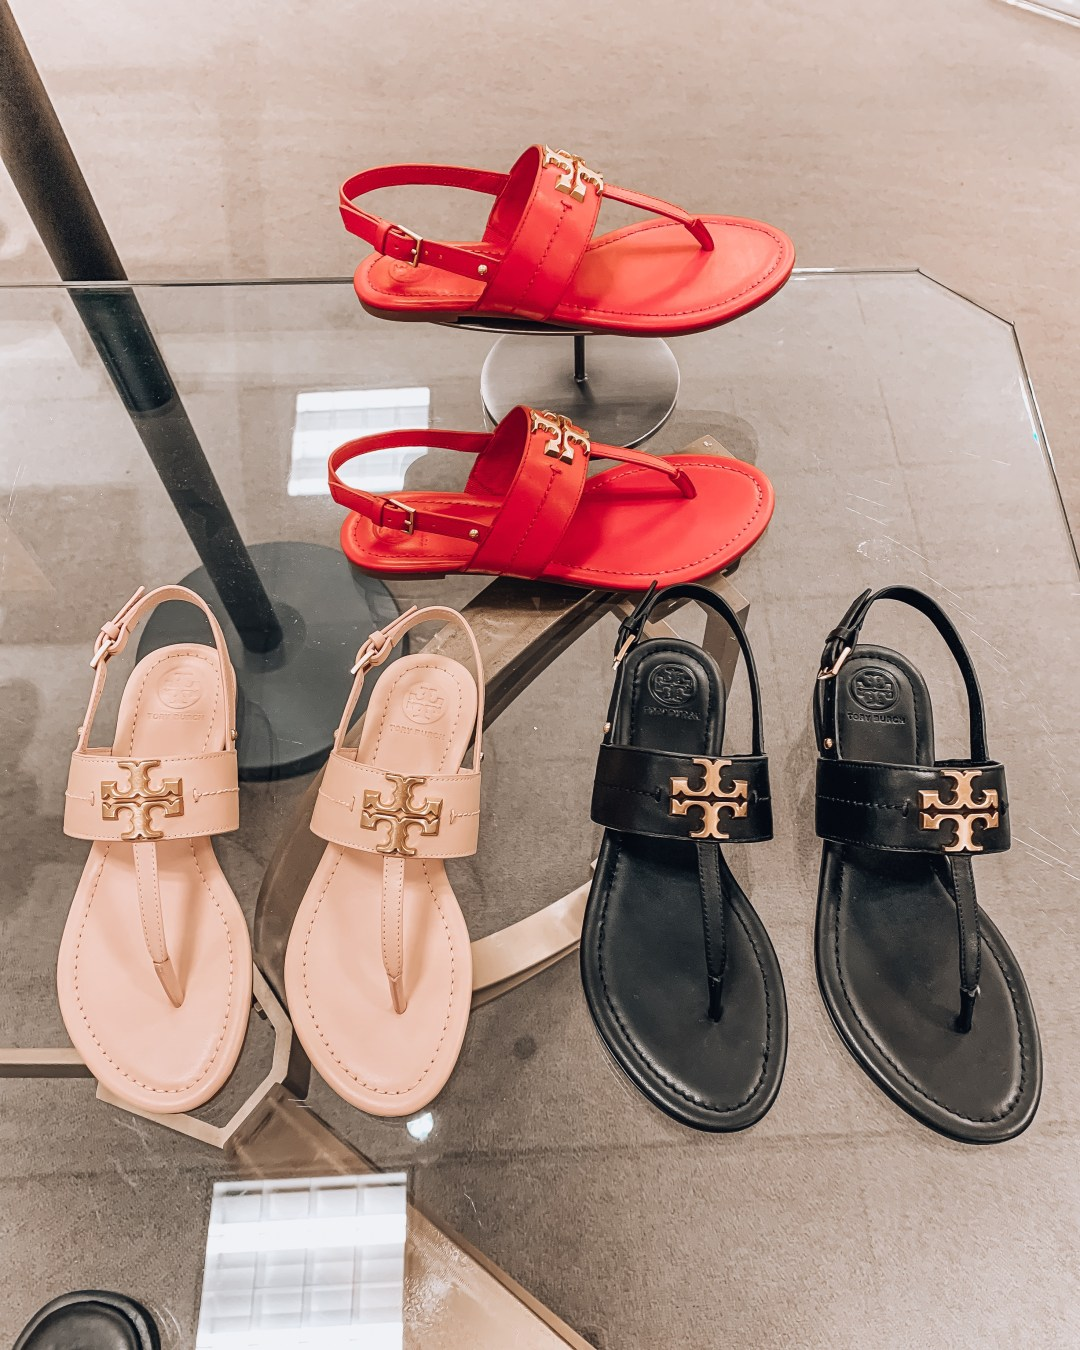 Nordstrom Anniversary Sale Tory Burch sandals